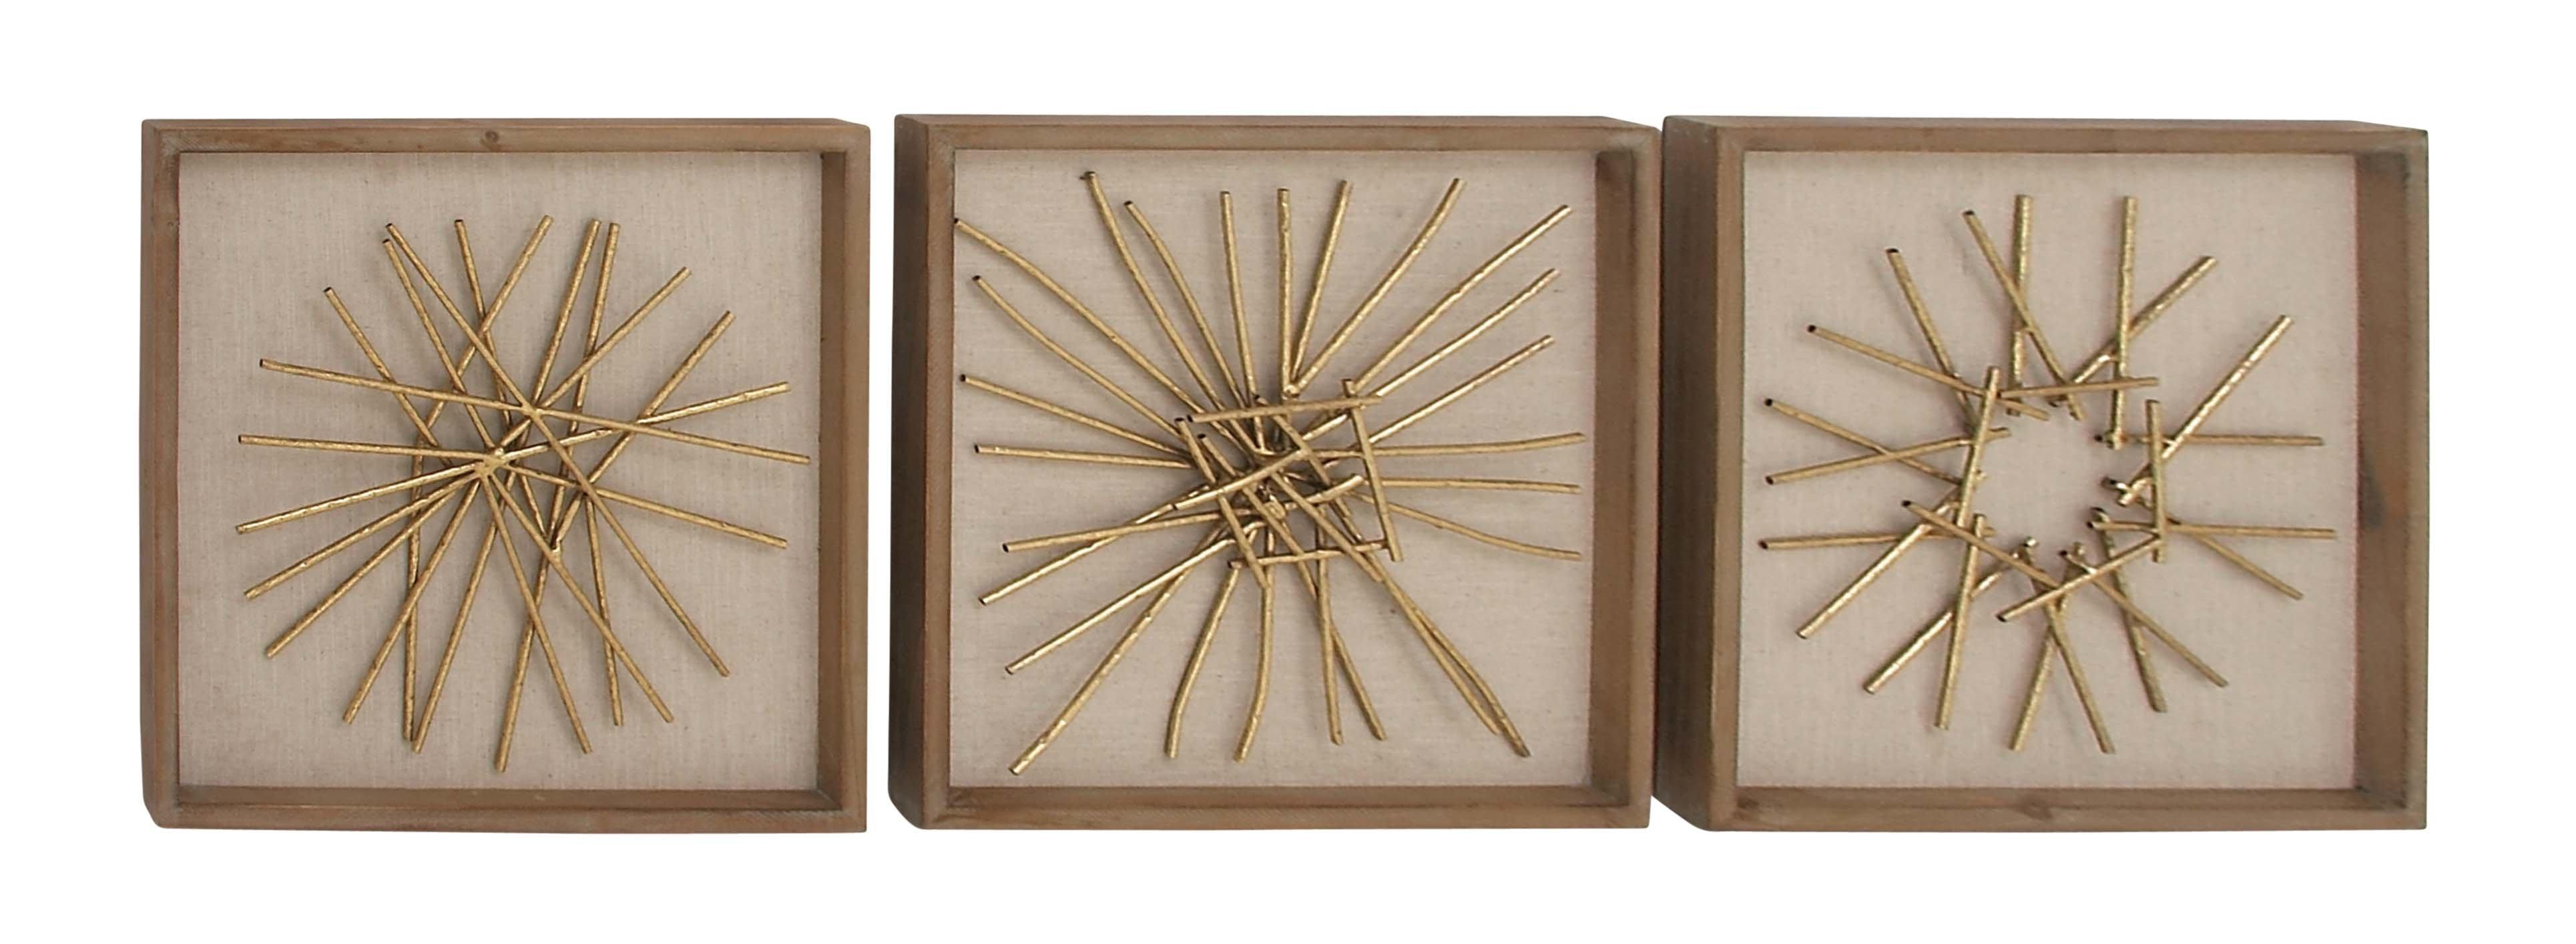 Modern & Contemporary 3 Piece Wall Decor Set | Allmodern regarding 2 Piece Starburst Wall Decor Sets (Image 24 of 30)